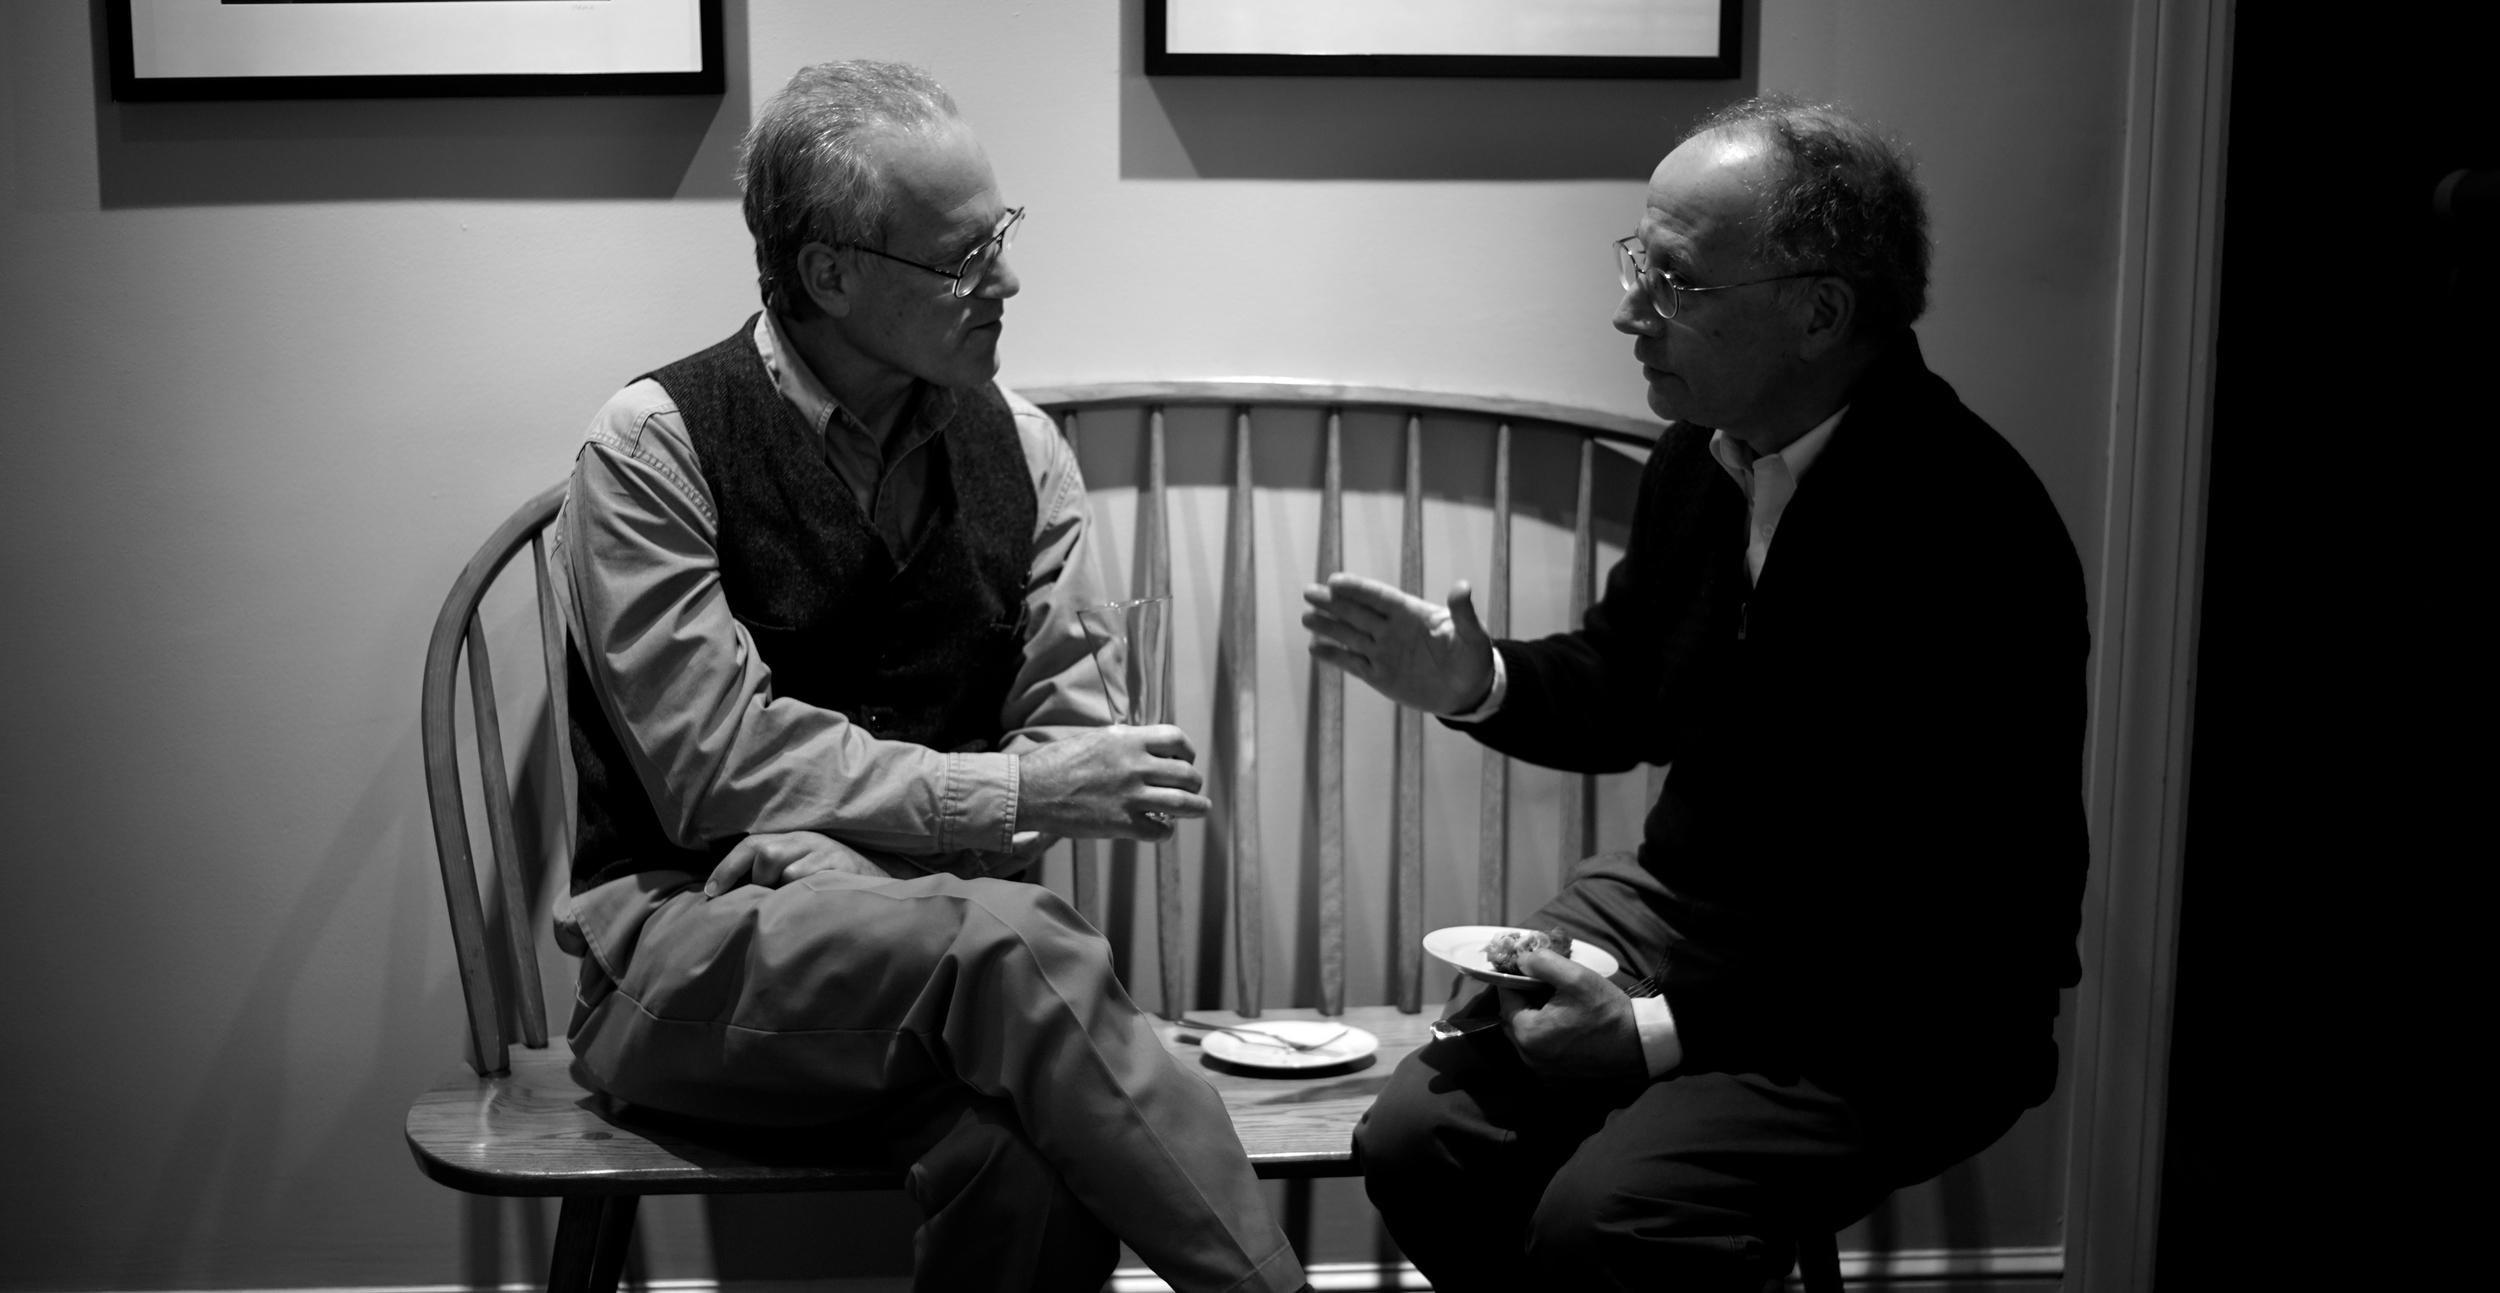 Peter Korn and Steve Durning